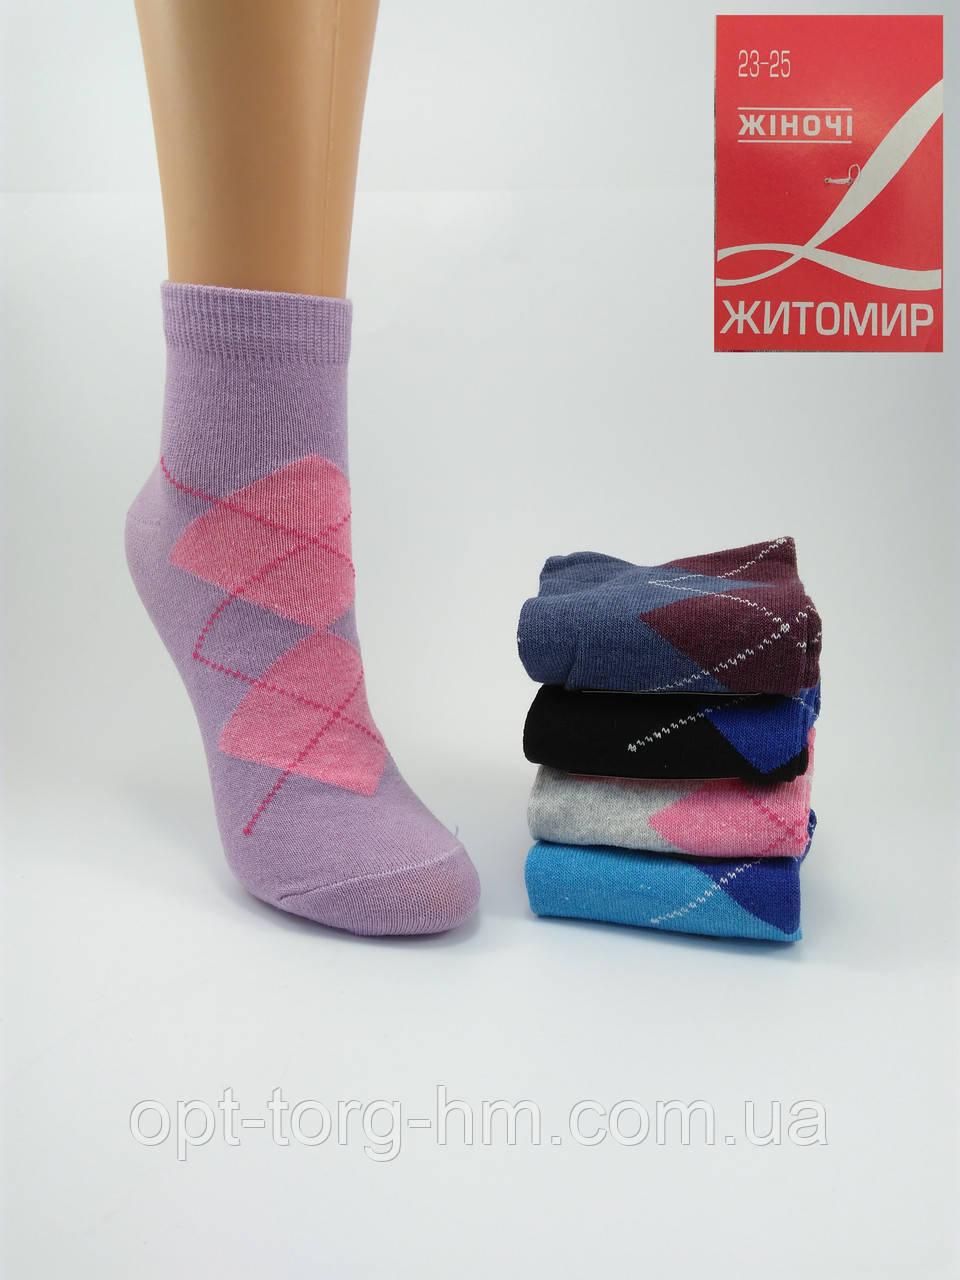 Короткие женские носки 23-25 (37-40)  Микс